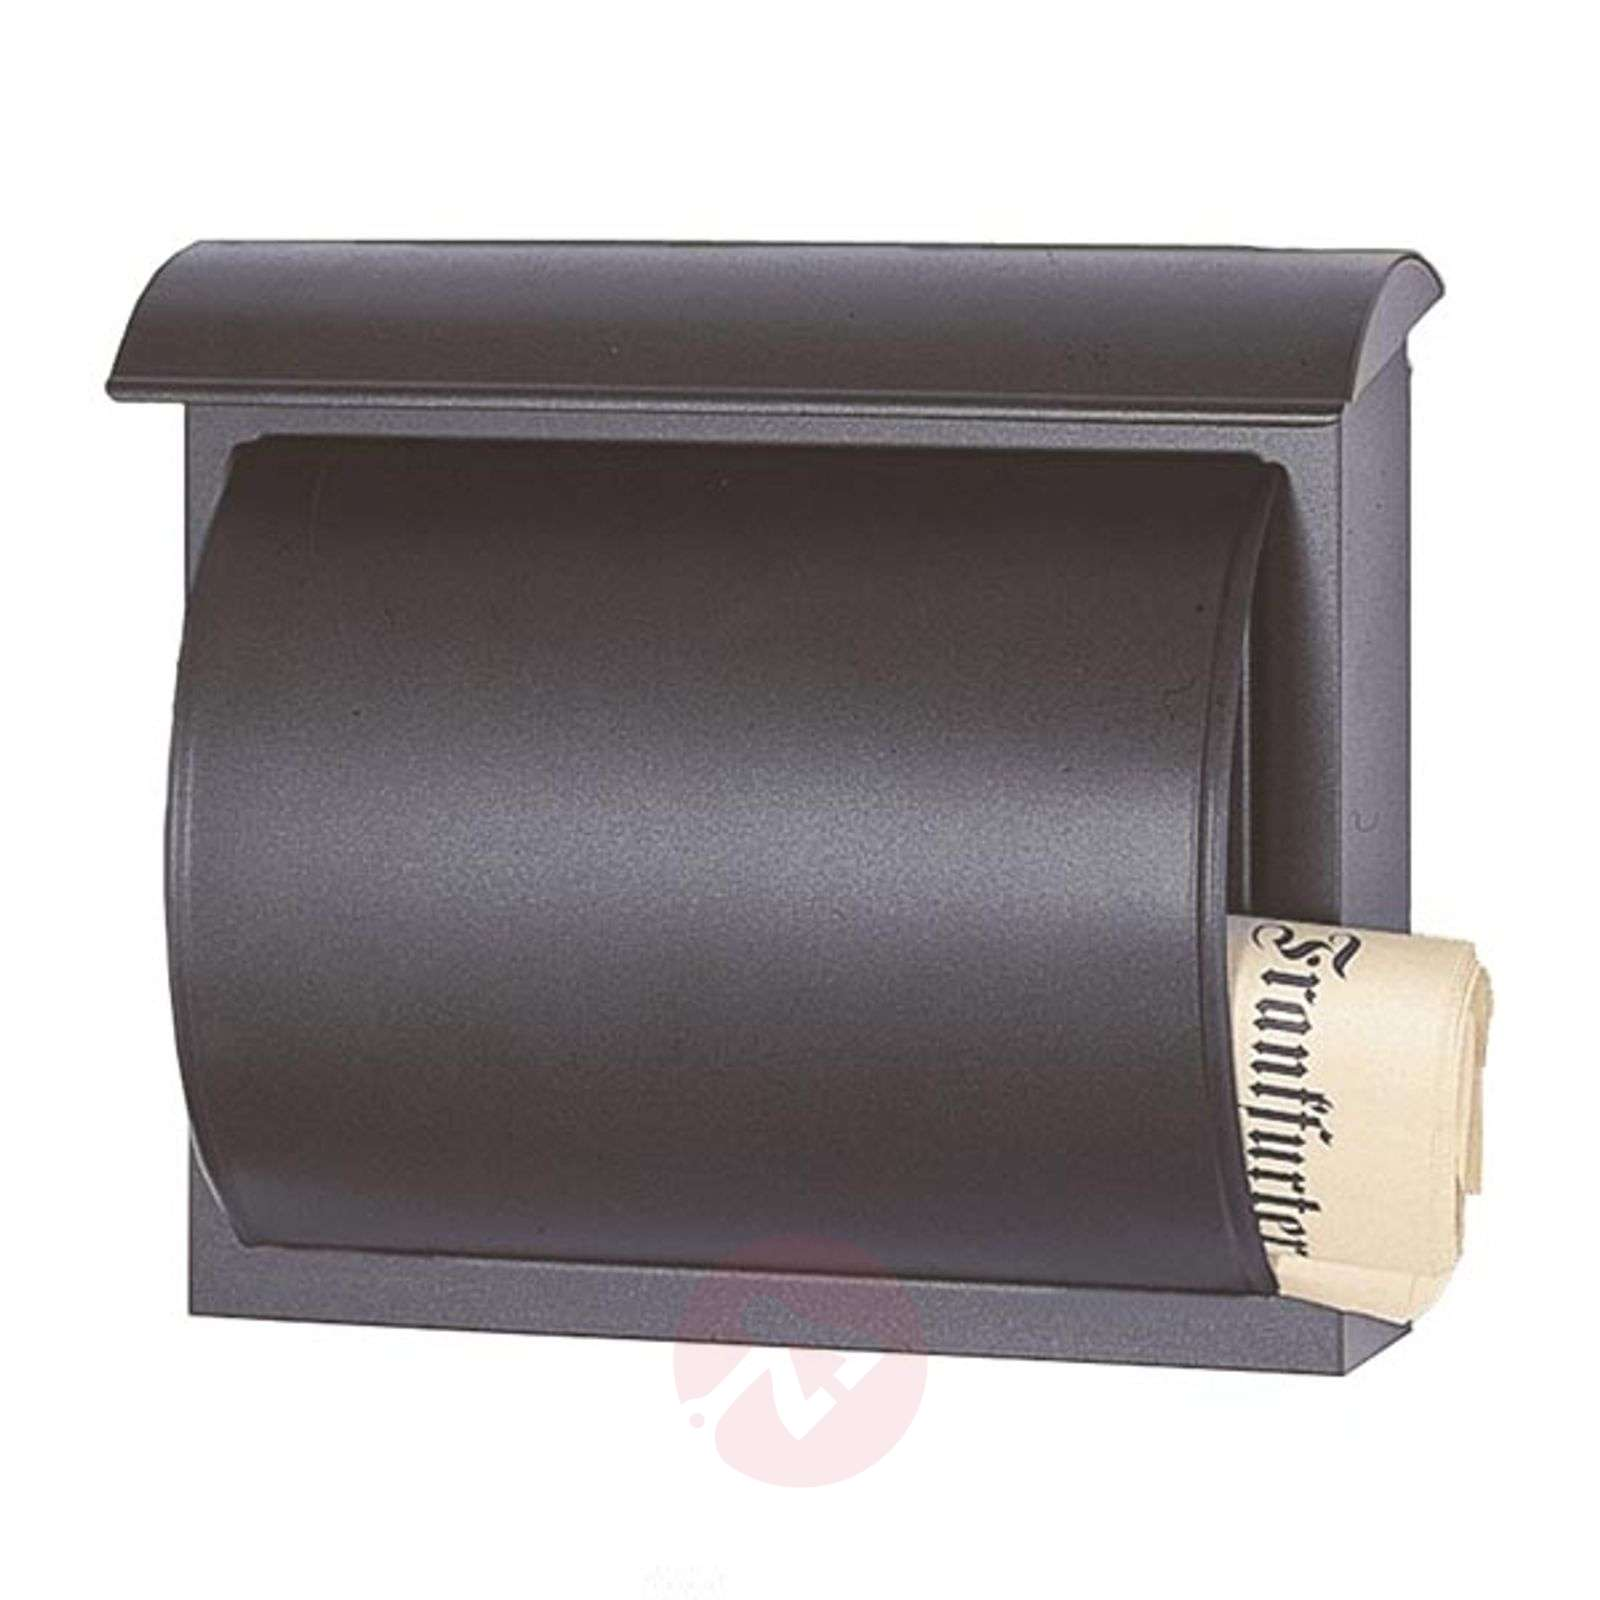 Letterbox TORES black-4502081-02